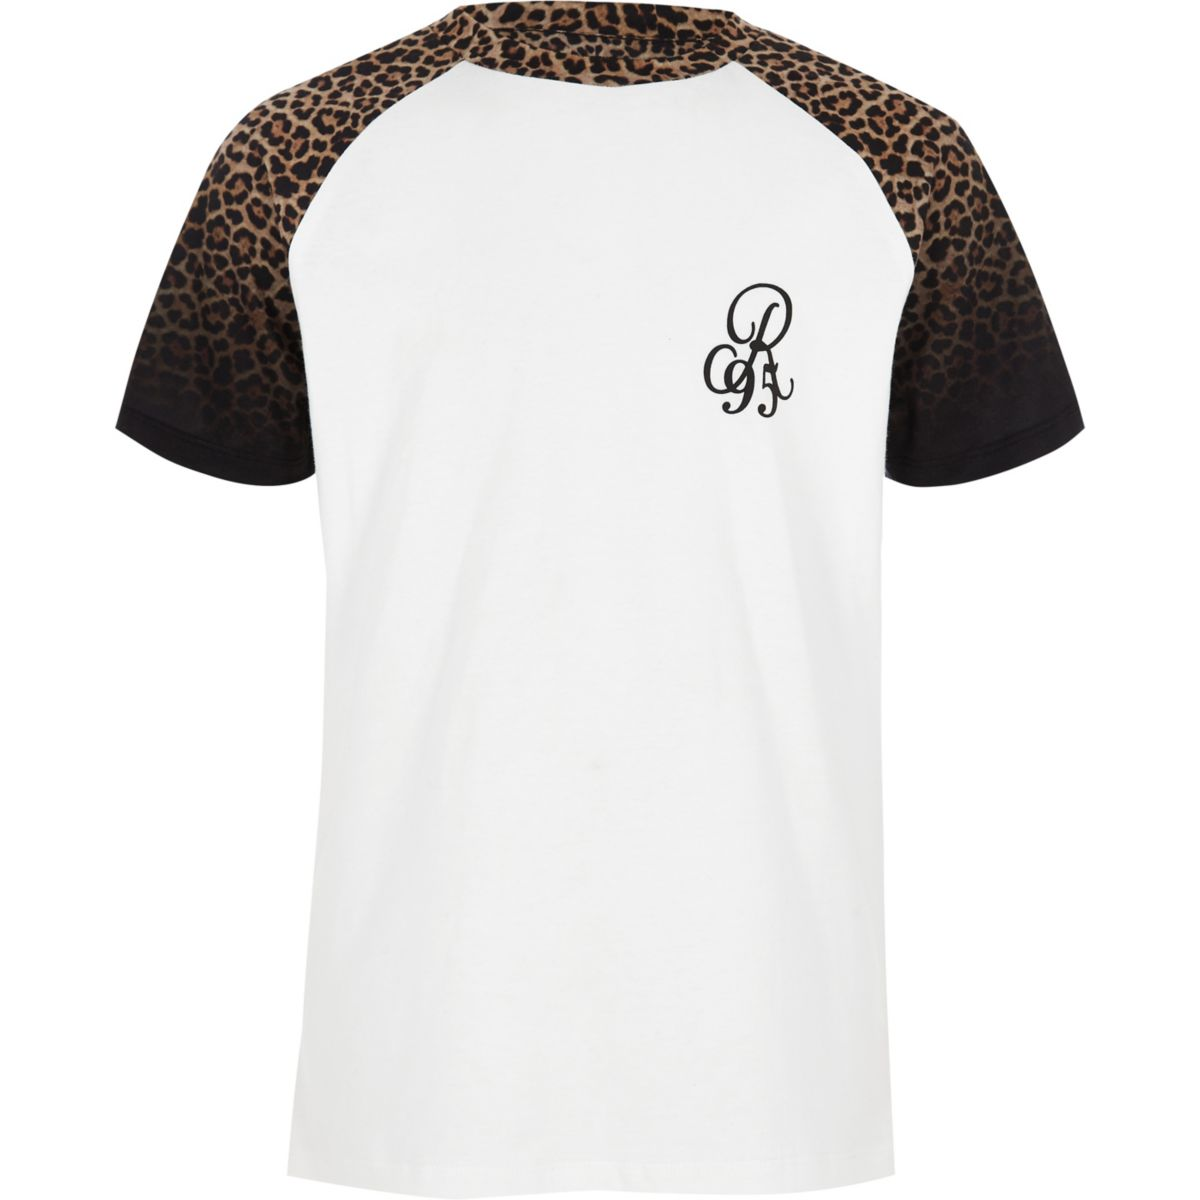 Boys black leopard print raglan T-shirt